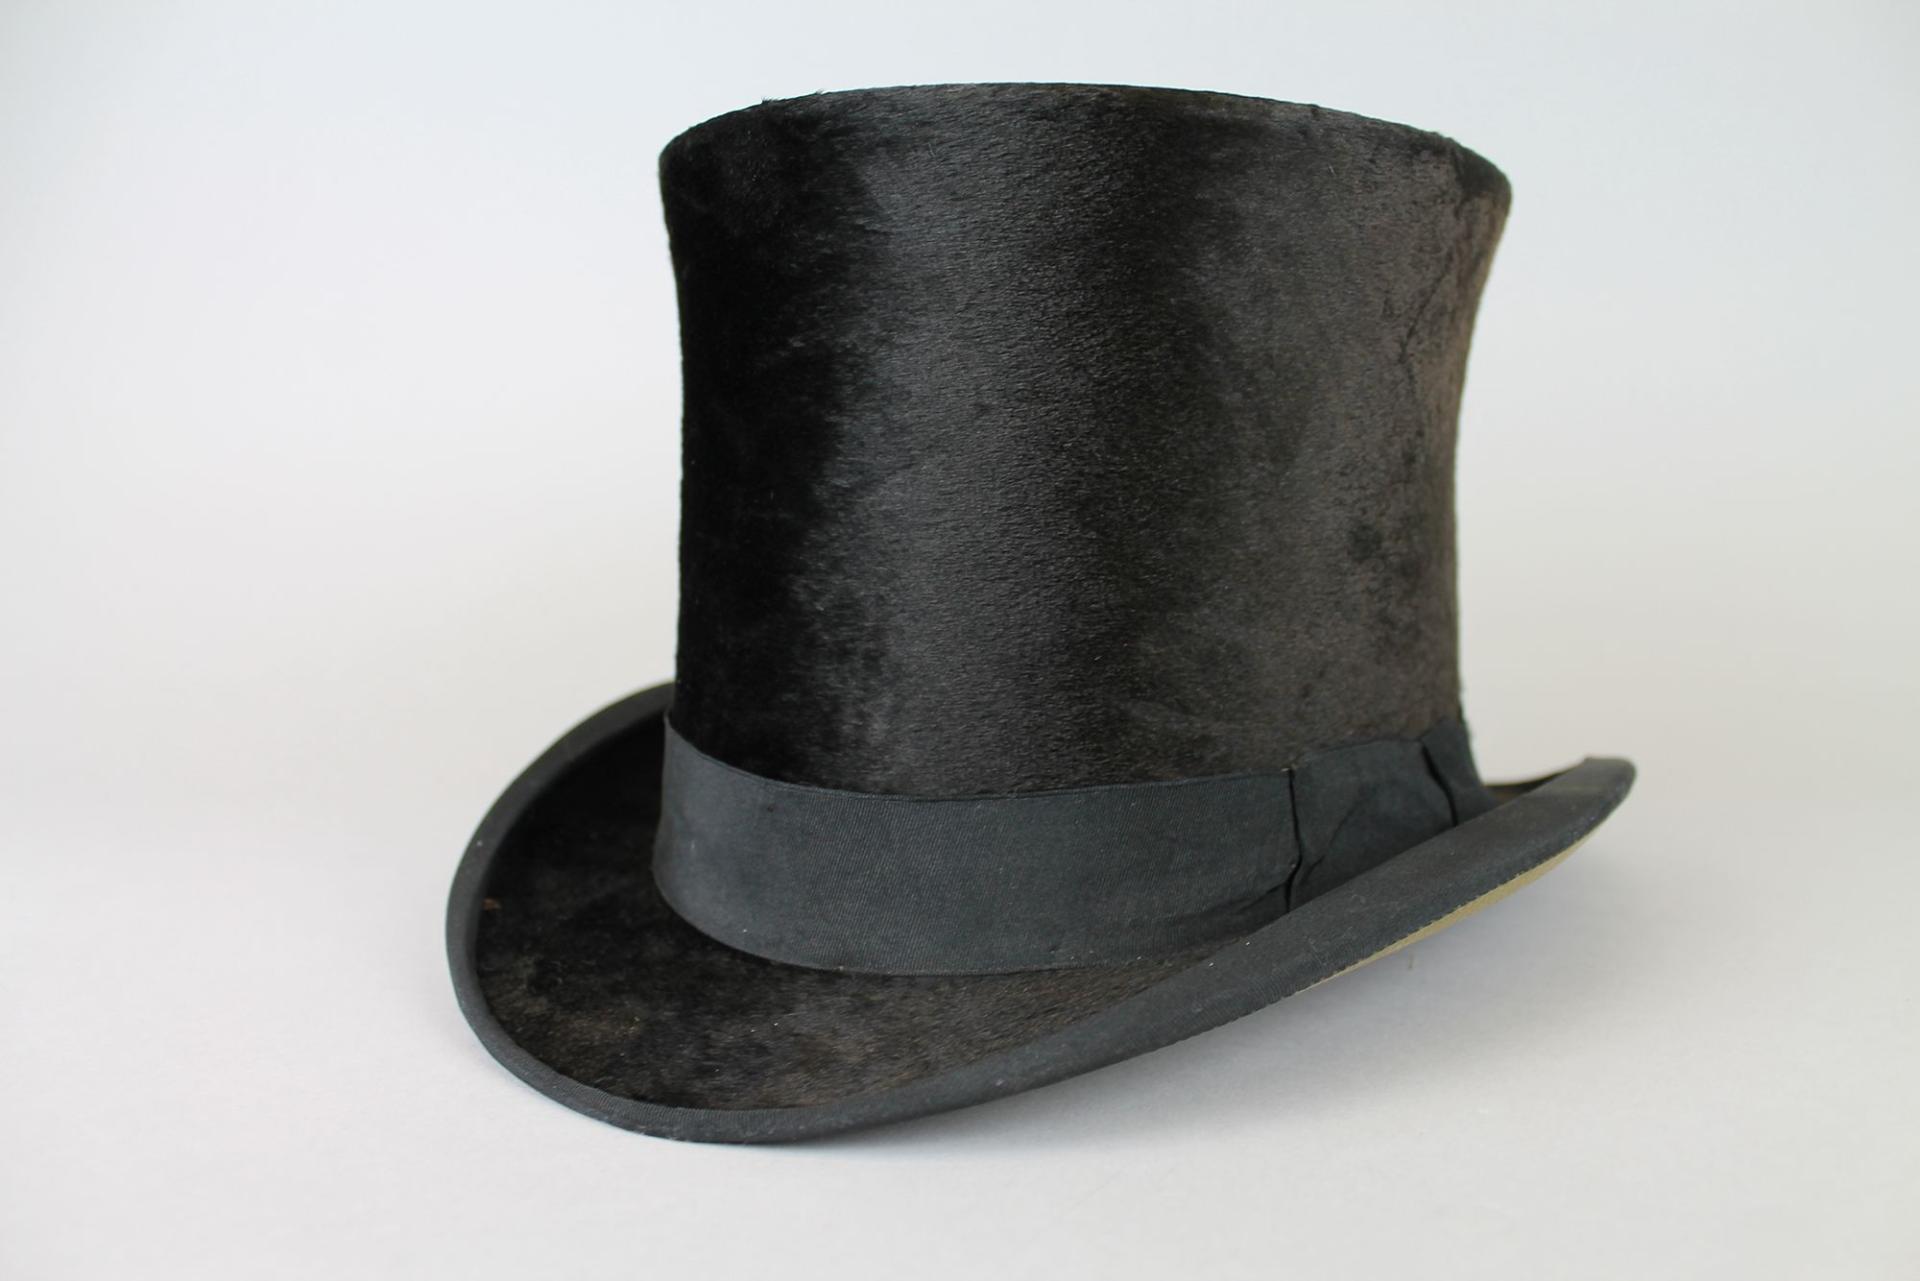 19th century top hat